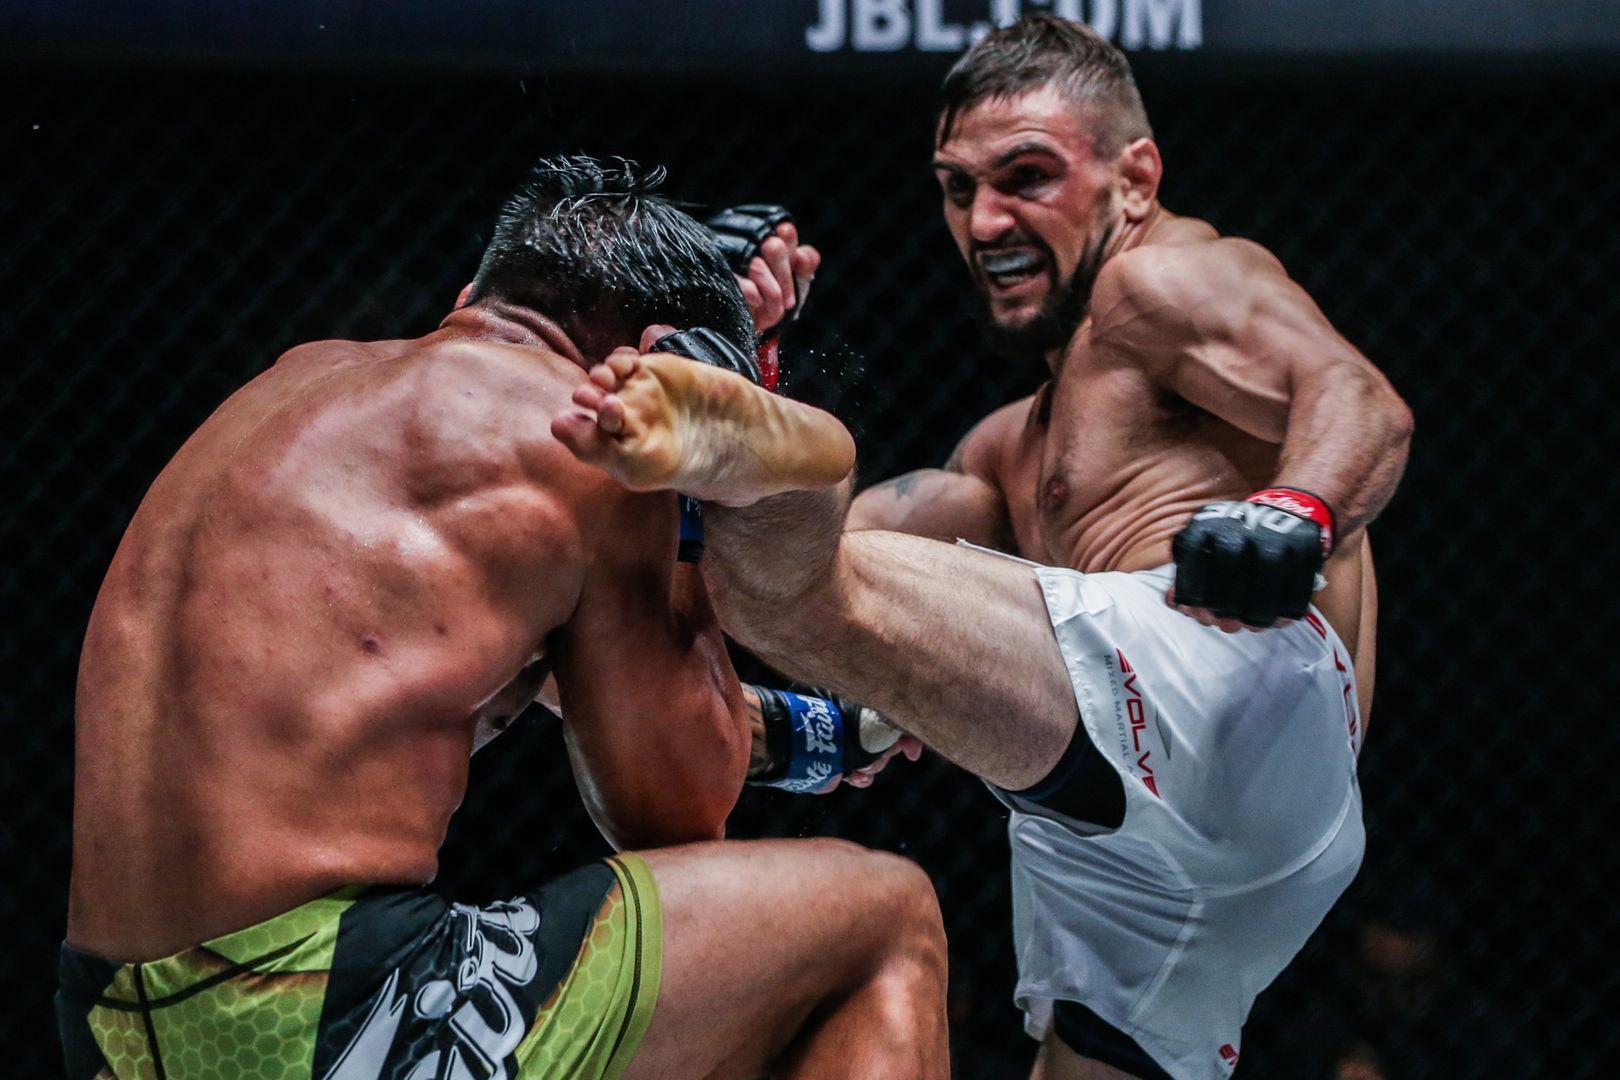 Troy Worthen kicks Mark Abelardo